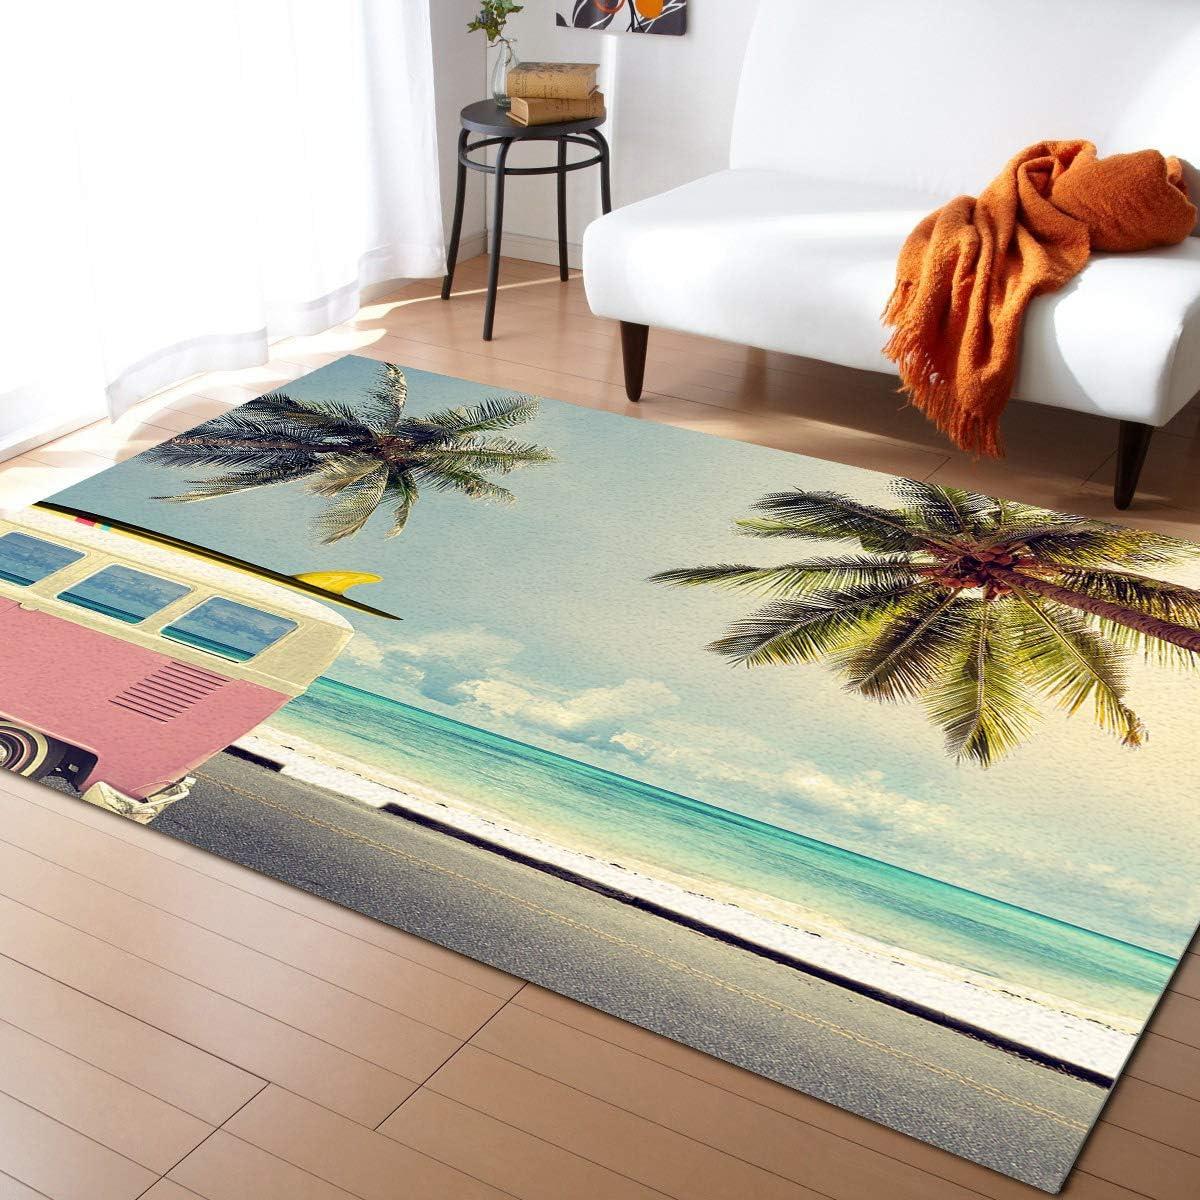 MuswannaA Area Rug for National uniform free Popular overseas shipping Bedroom Room- Summer Ocean Living Coastal